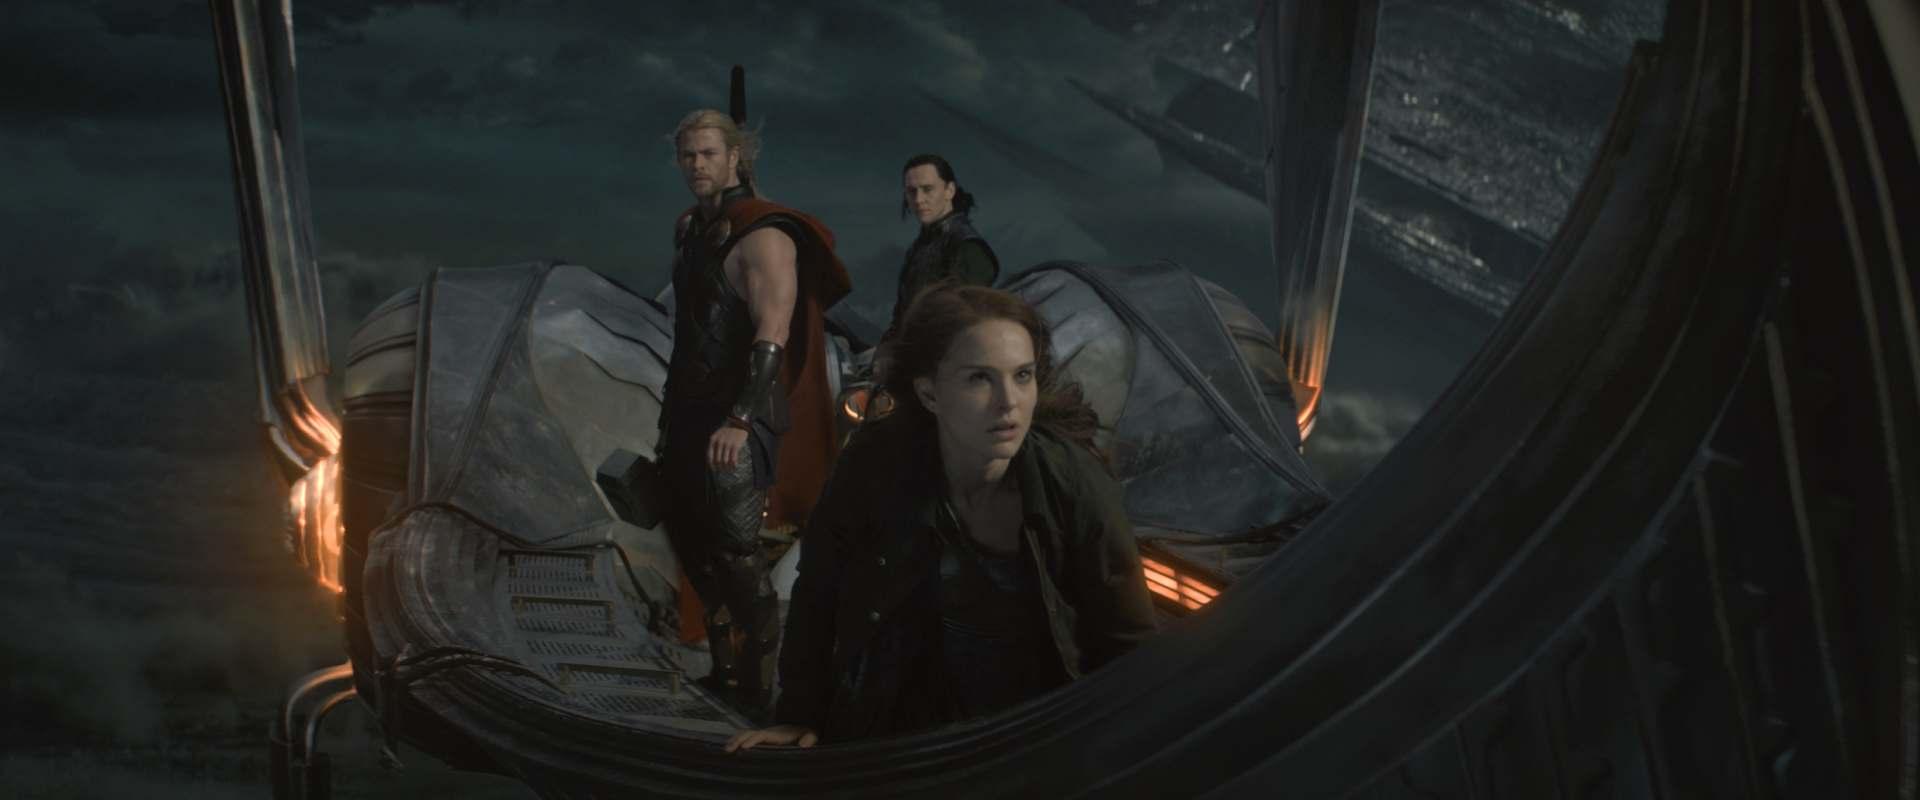 Watch Thor The Dark World On Netflix Today Netflixmoviescom